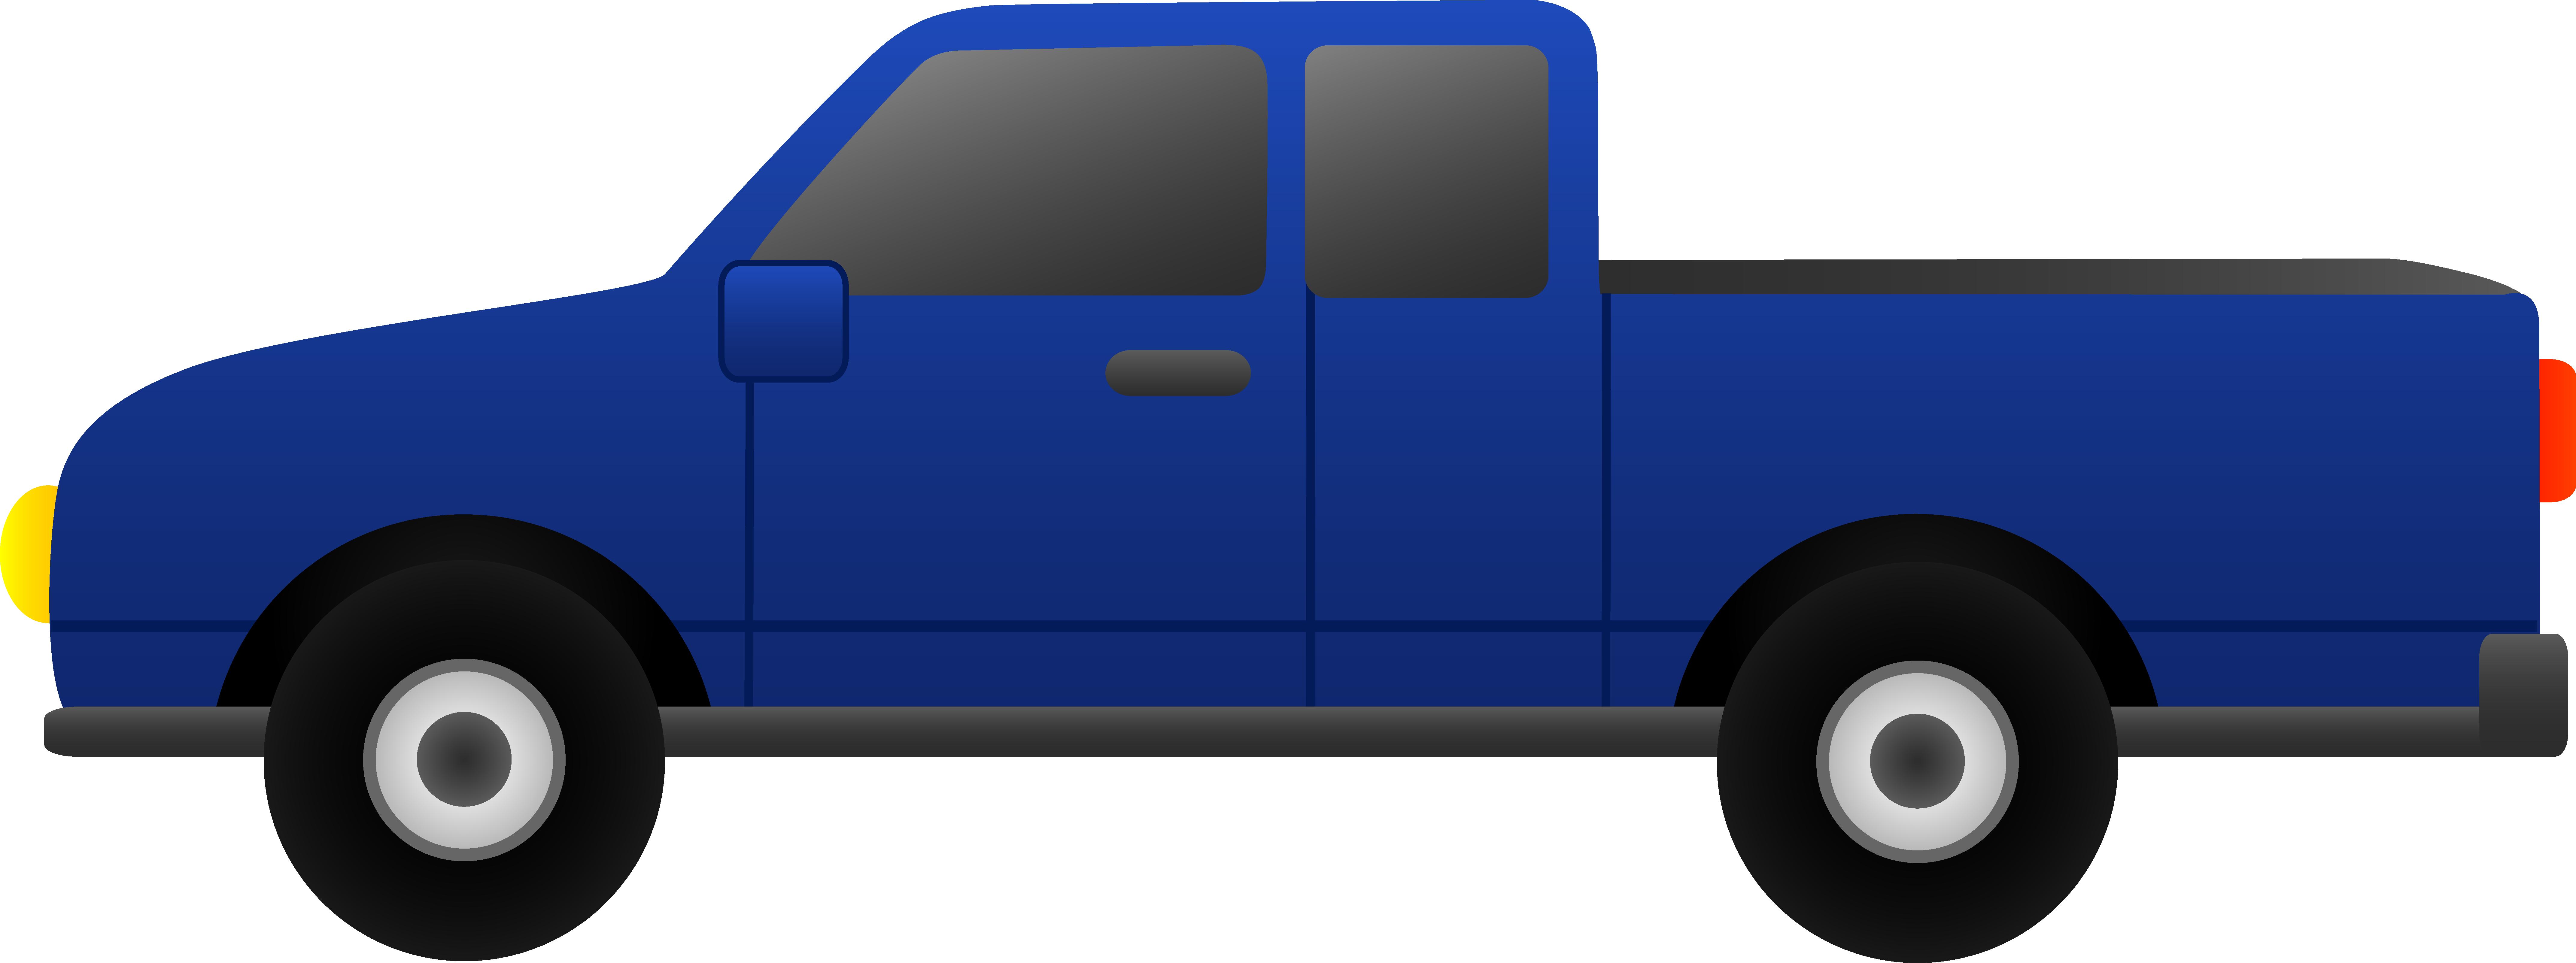 8576x3207 Blue Pickup Truck Clip Art Clipart Panda